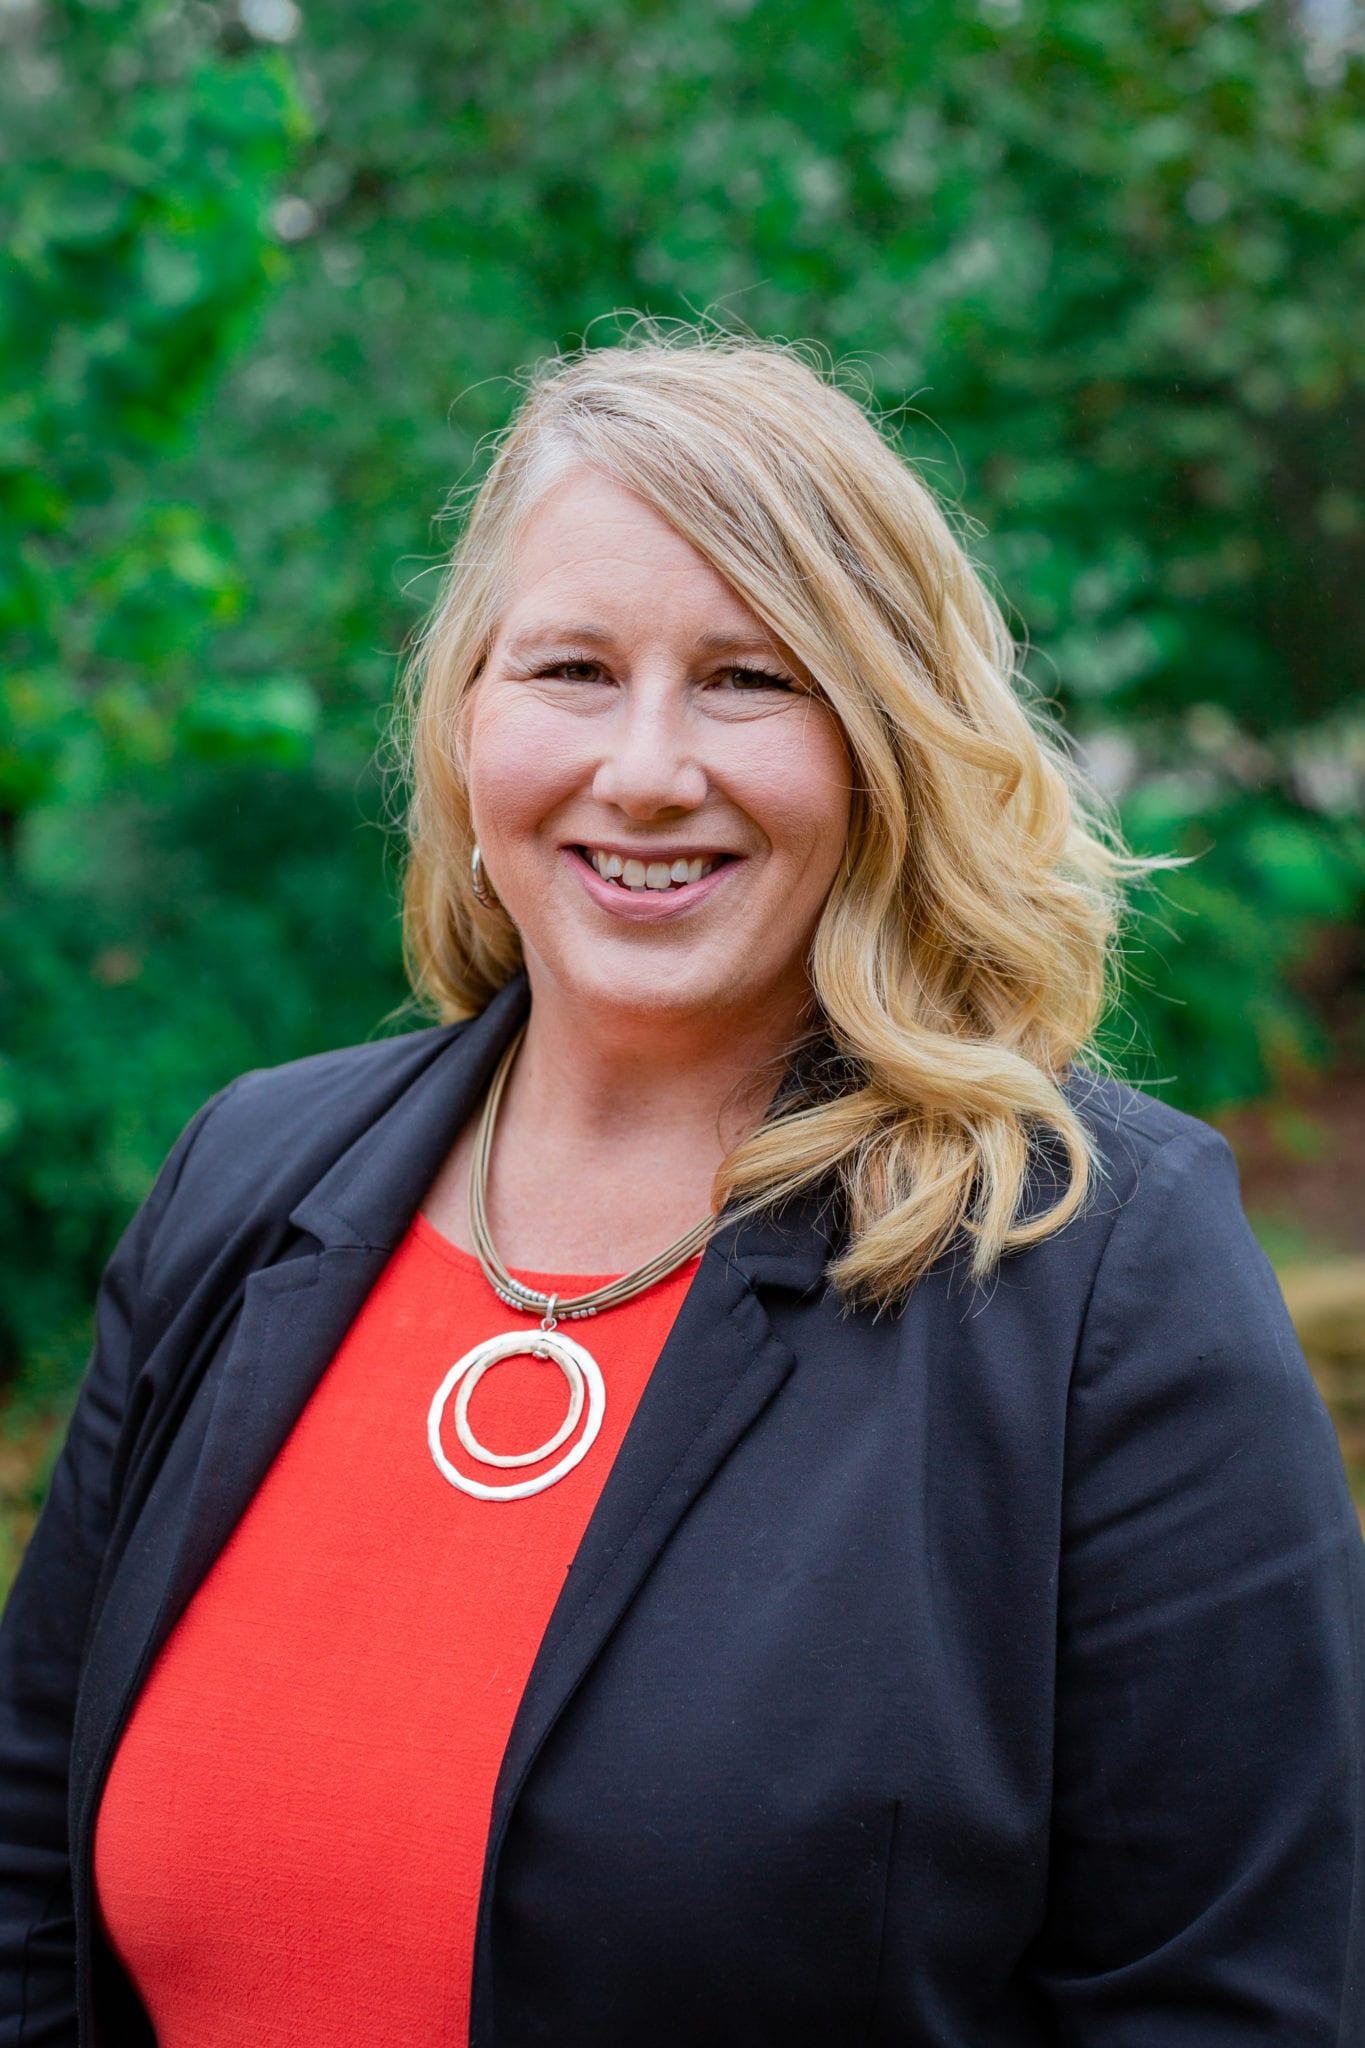 Jennifer Bailey, KVNE Director of Marketing & Community Outreach